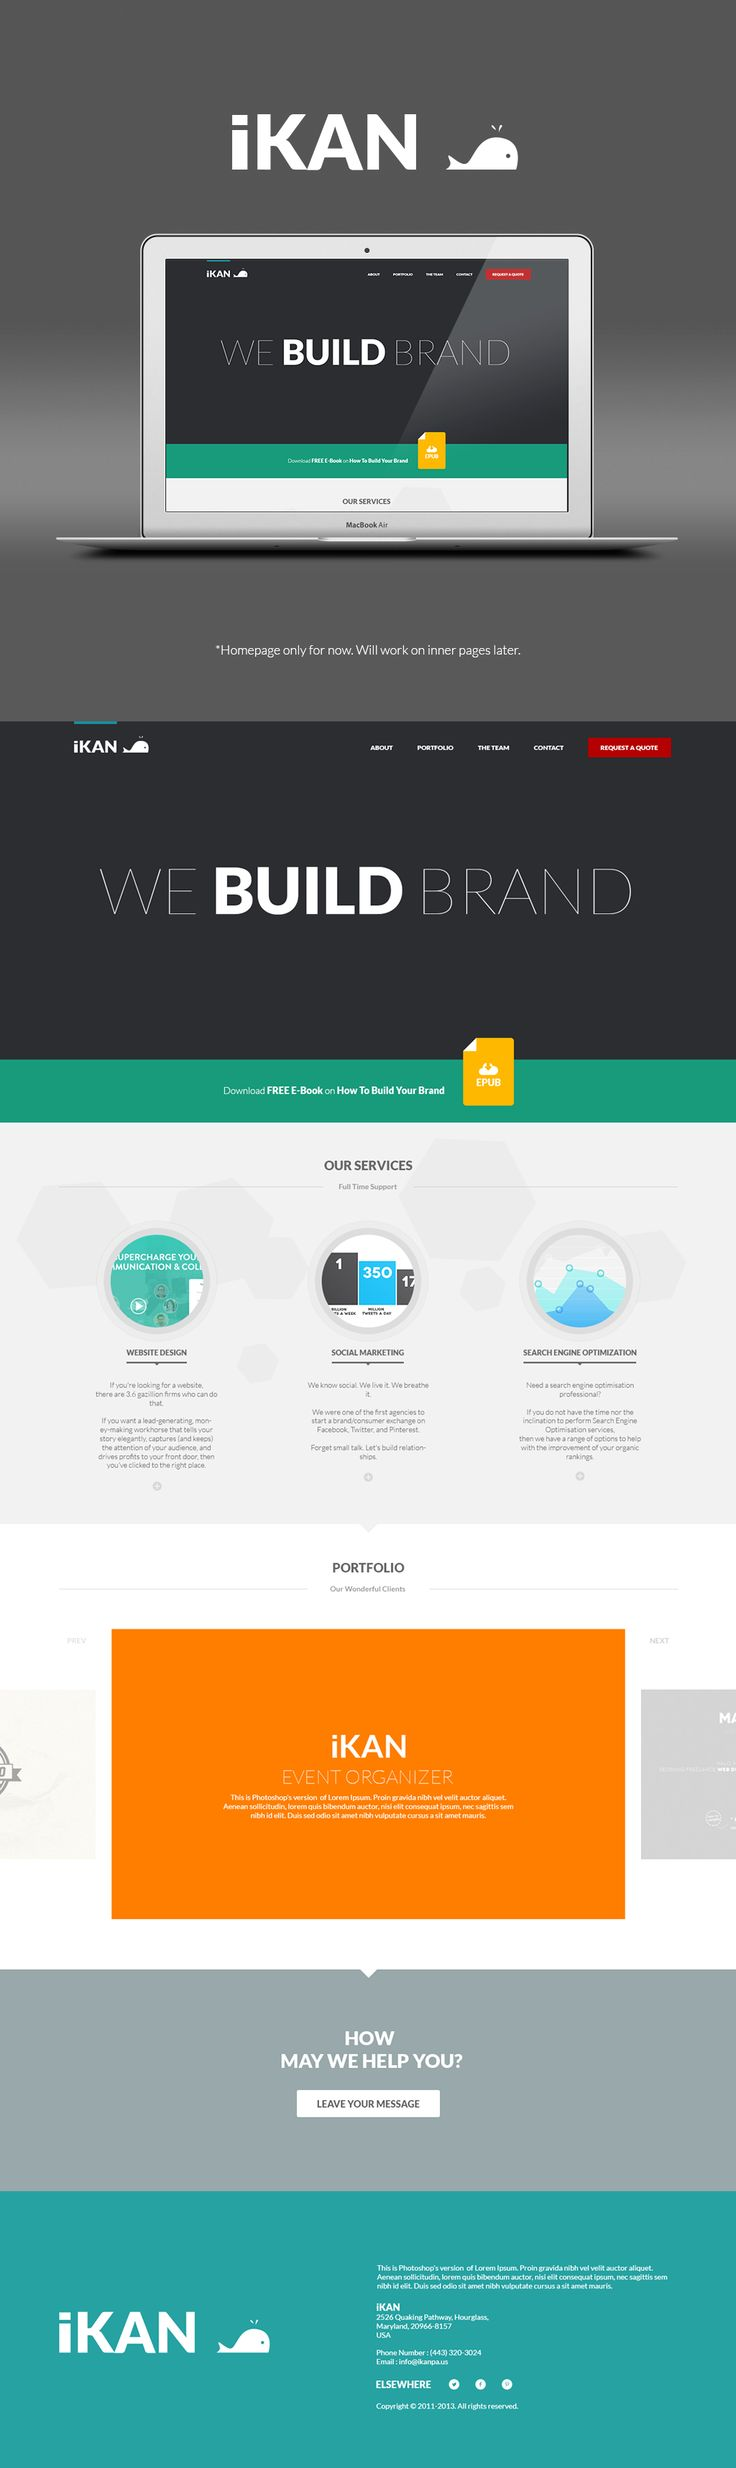 Flat Design Concept – Web Design Examples for Inspiration